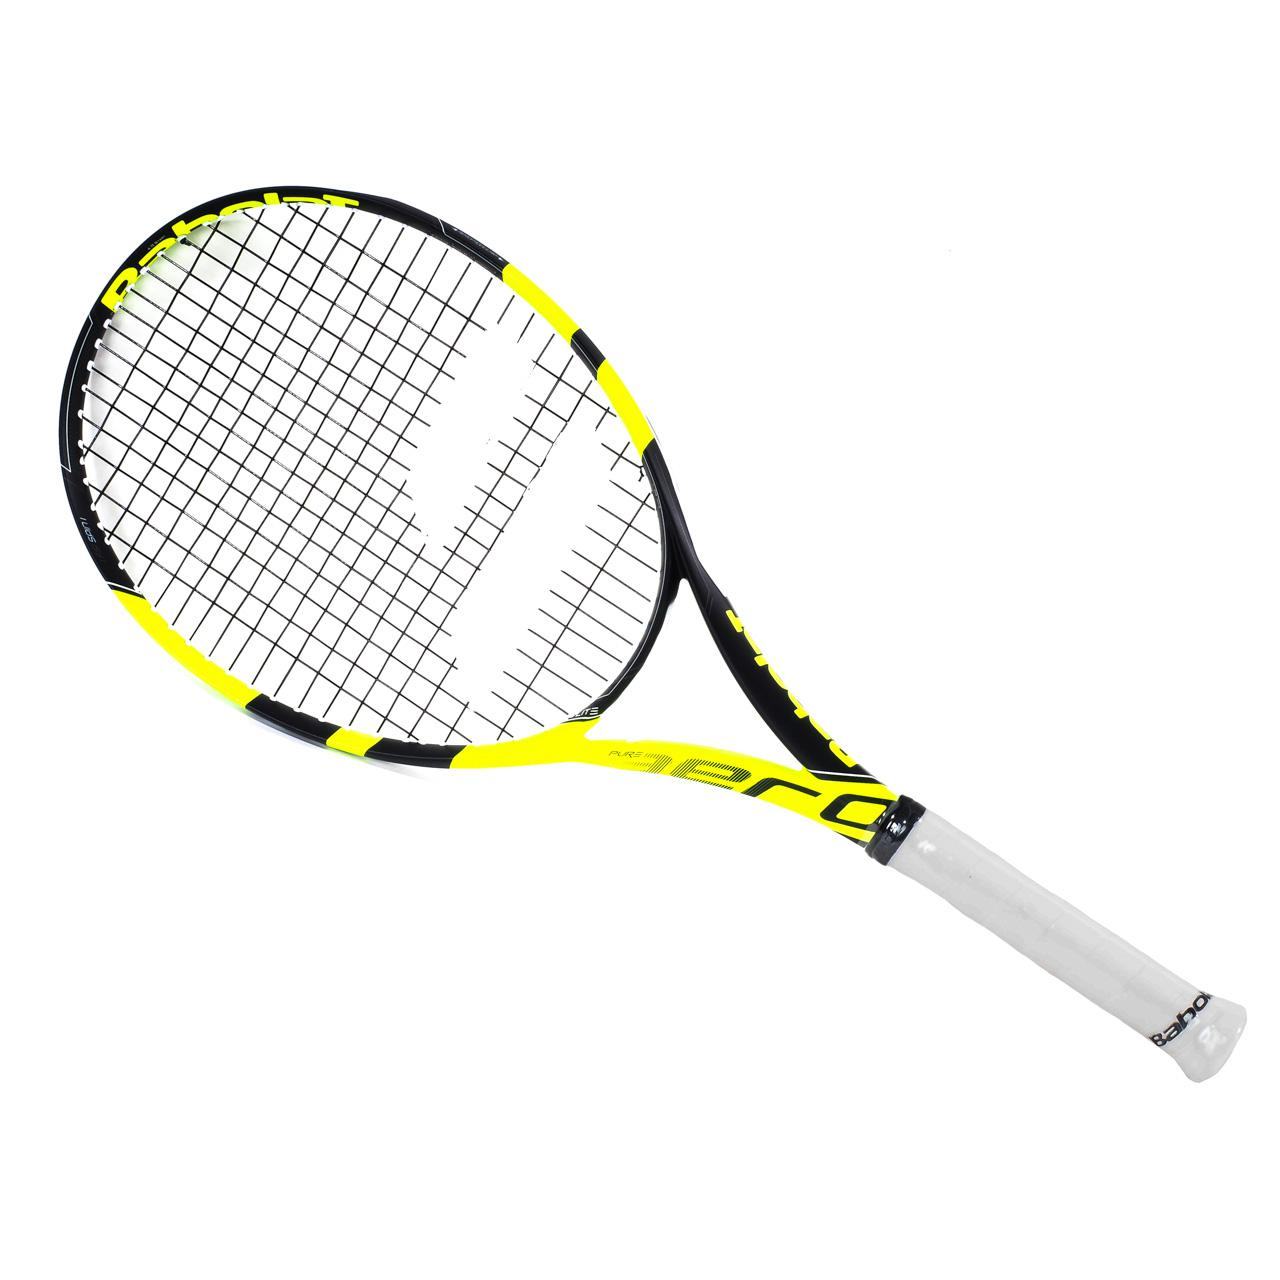 raquette de tennis babolat pure aero lite 2016 noir 78308. Black Bedroom Furniture Sets. Home Design Ideas